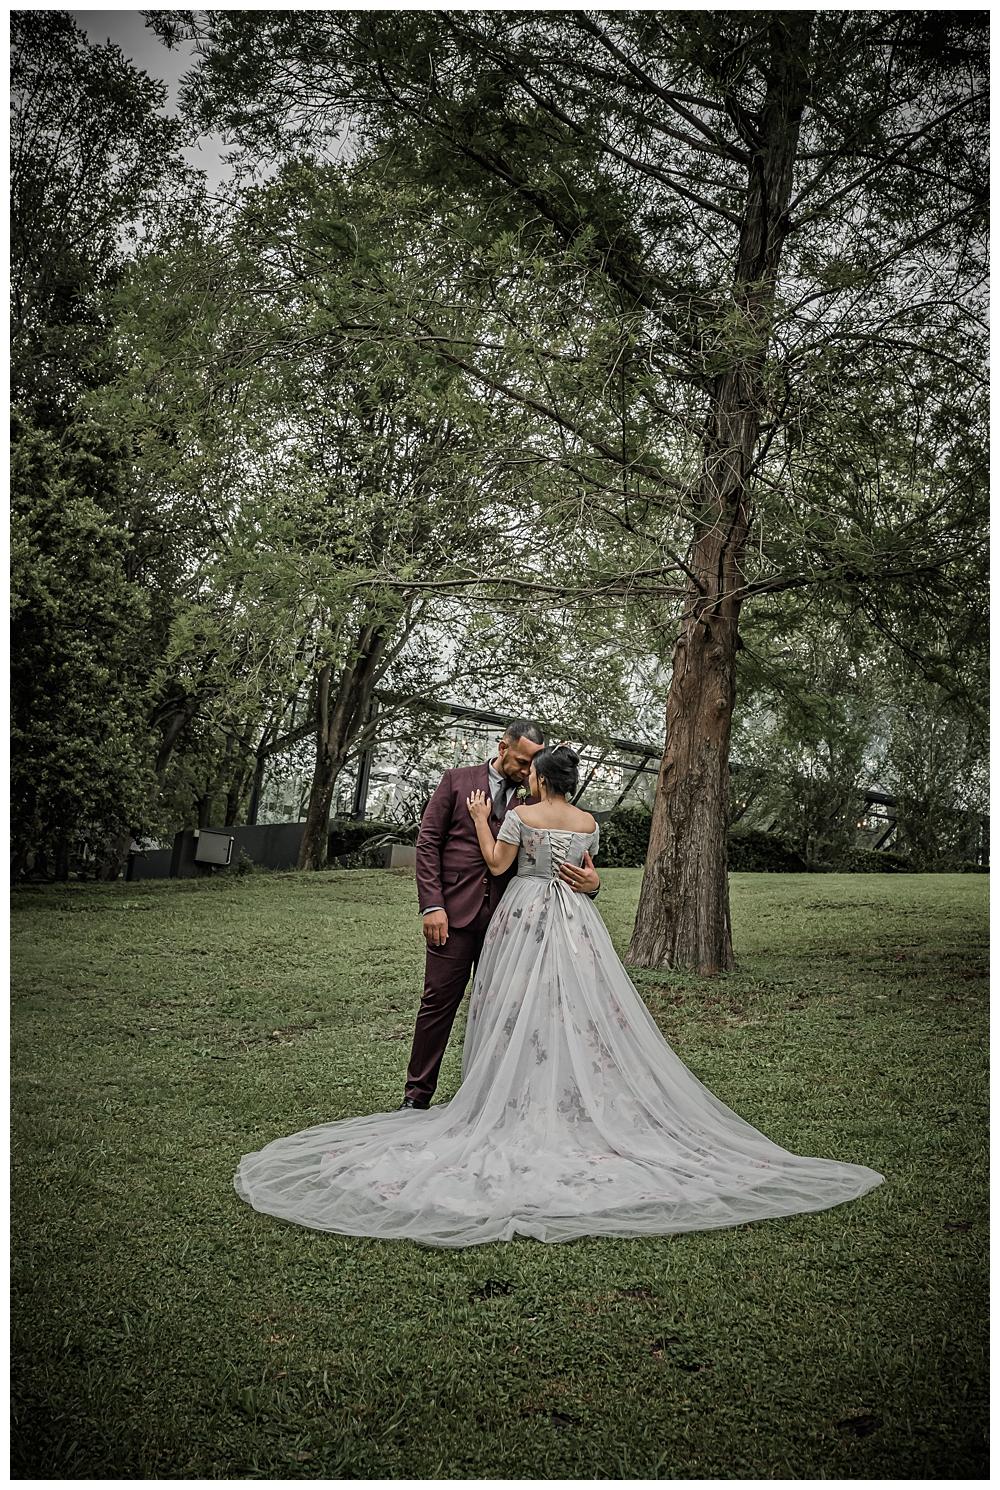 Best_Wedding_Photographer_AlexanderSmith_0940.jpg